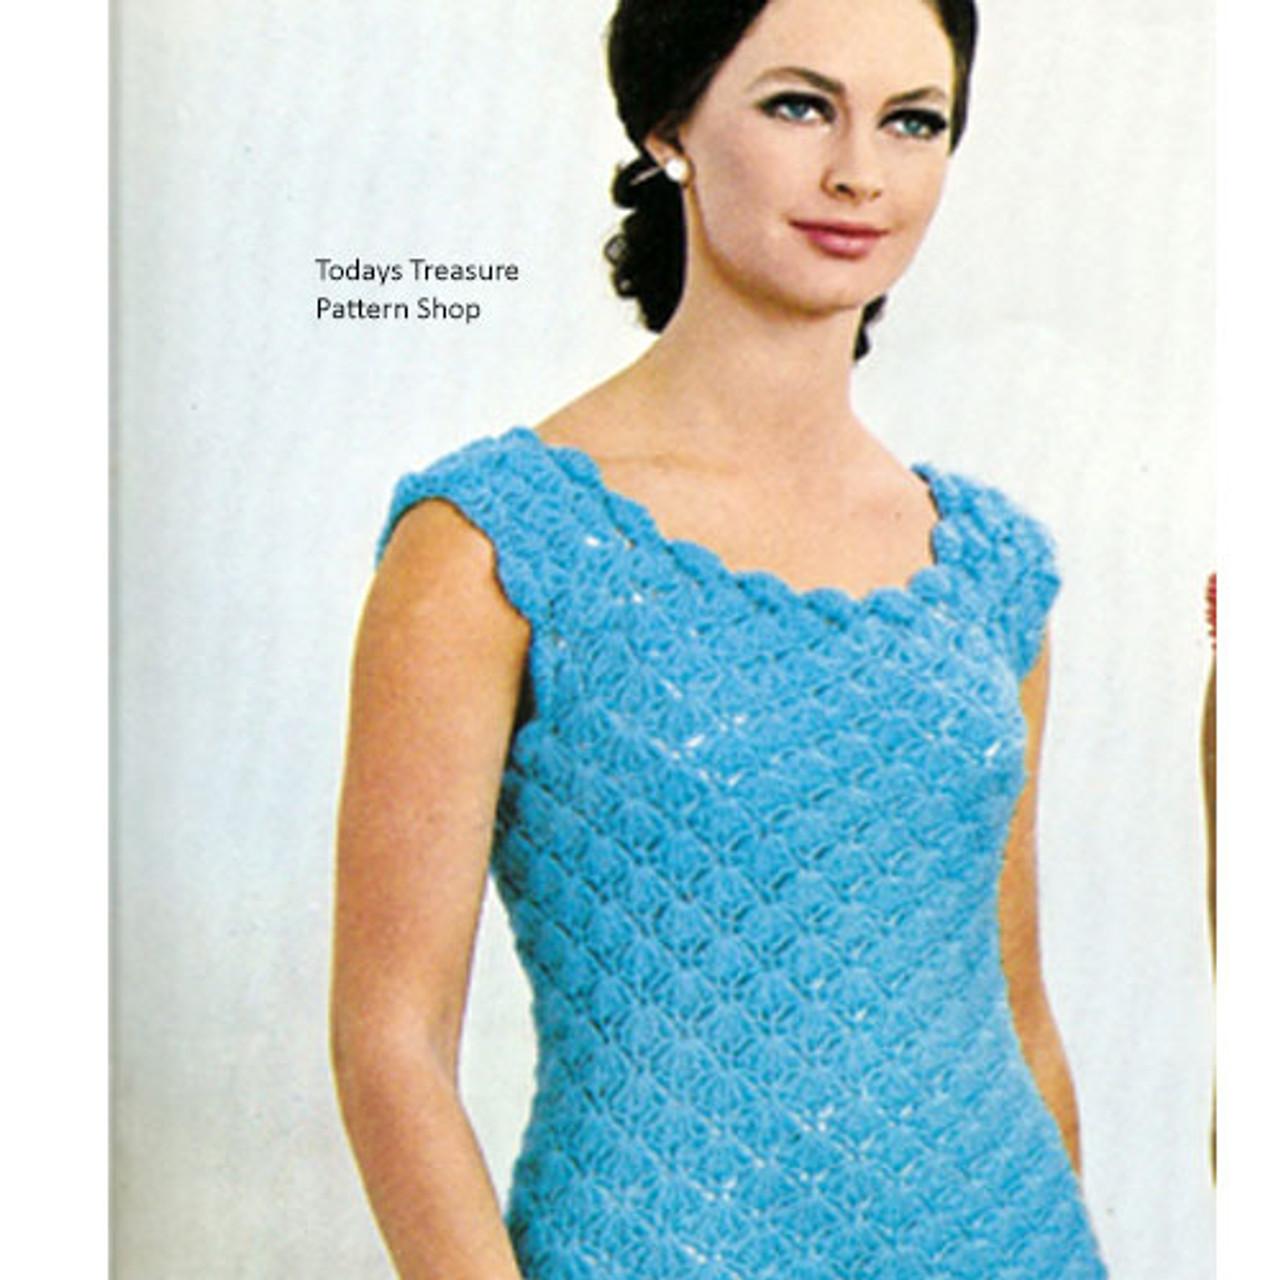 Vintage Crochet Dress in Shell Stitch